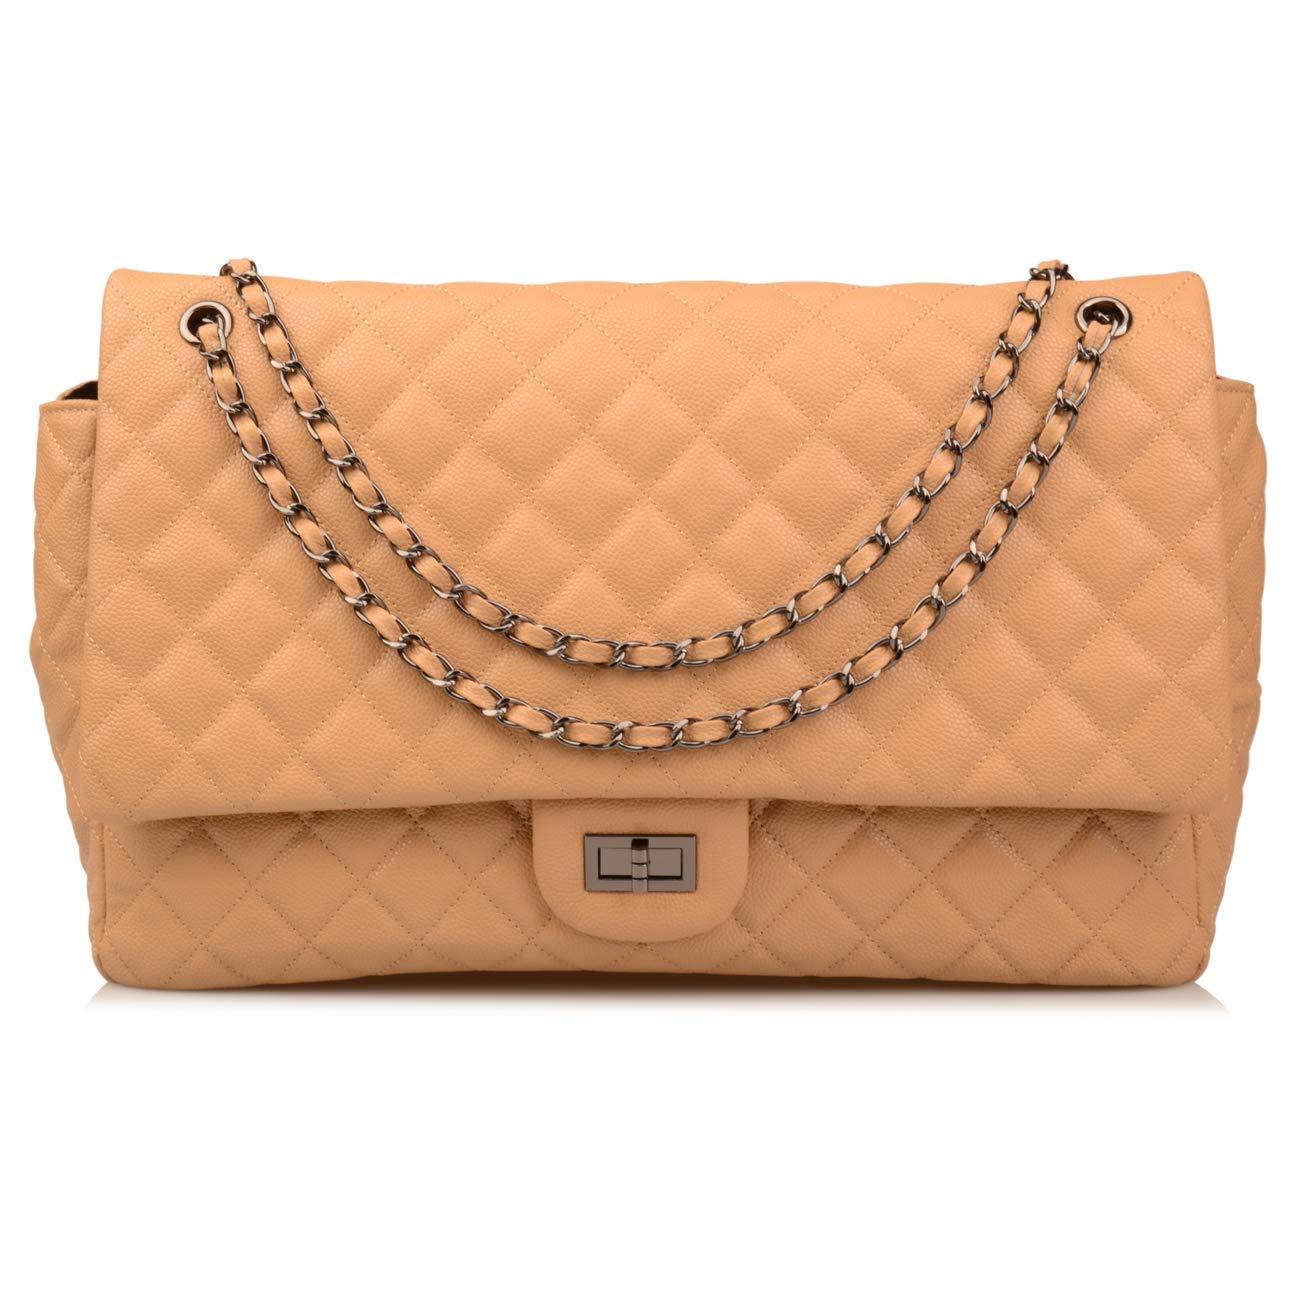 Ainifeel Women's Genuine Leather Oversize Quilted Flap Handbag Large Travelling Tote Bag Luggage Holdall (Oversize, Apricot (gunmetal hardware))